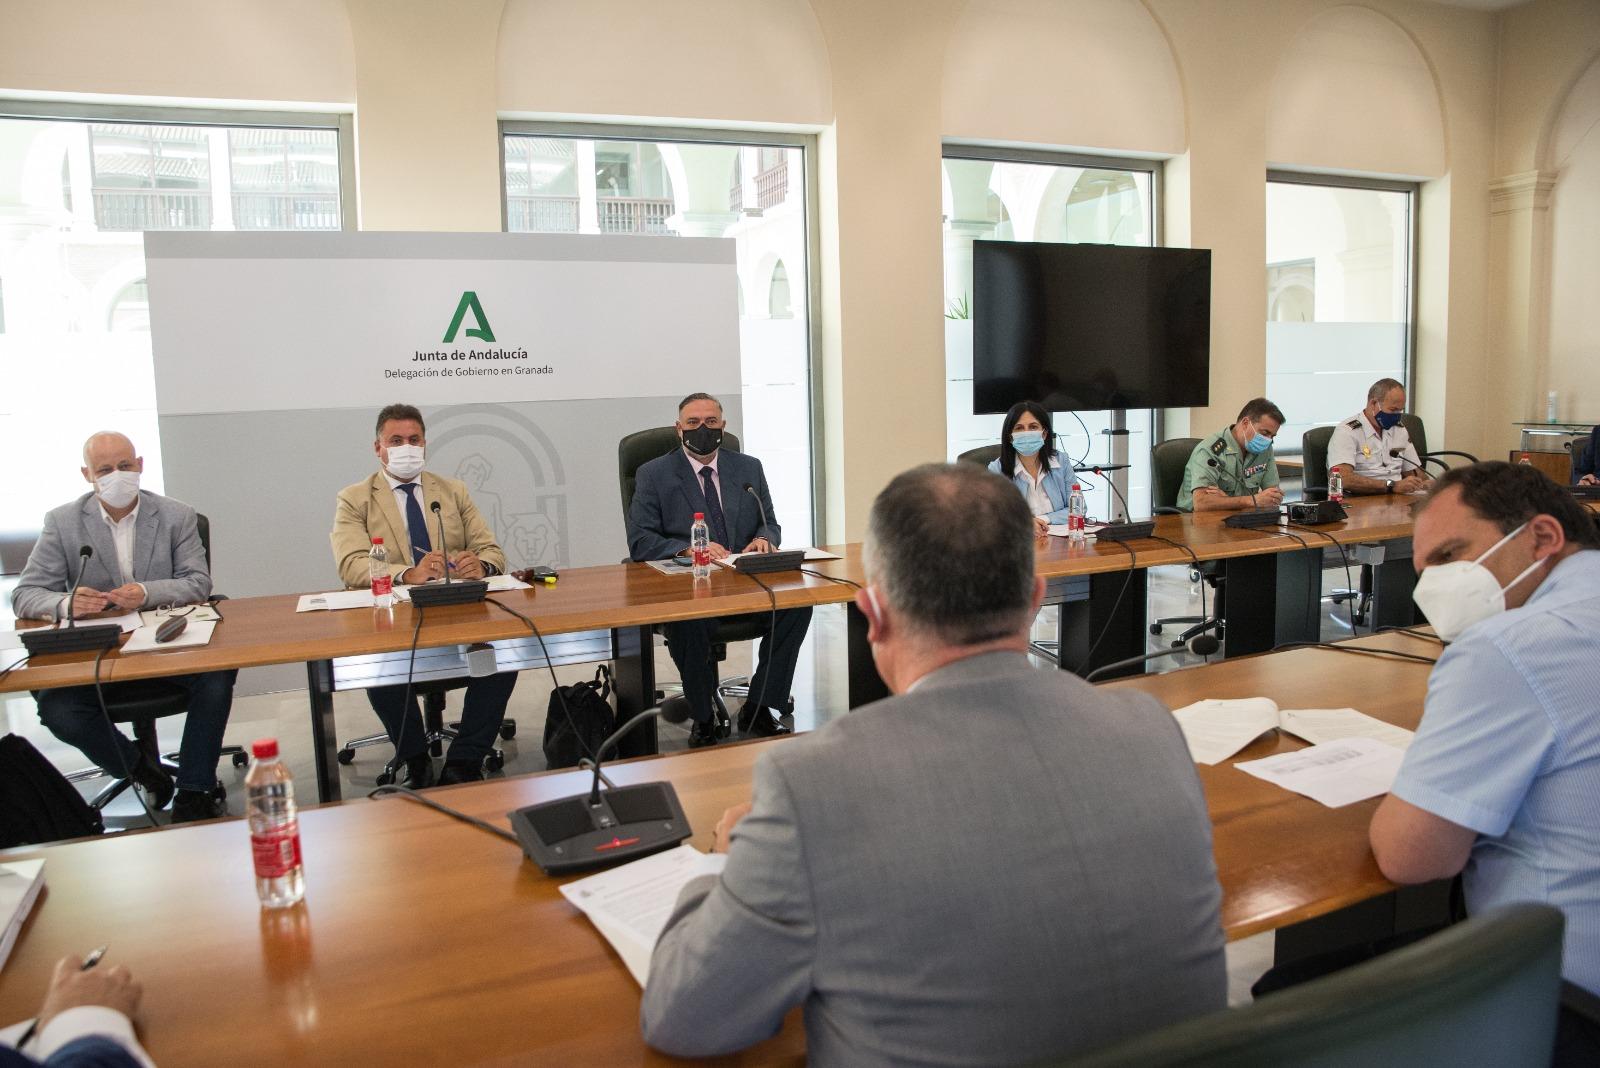 La Junta asigna casi 25 millones de euros al operativo INFOCA en la provincia de Granada